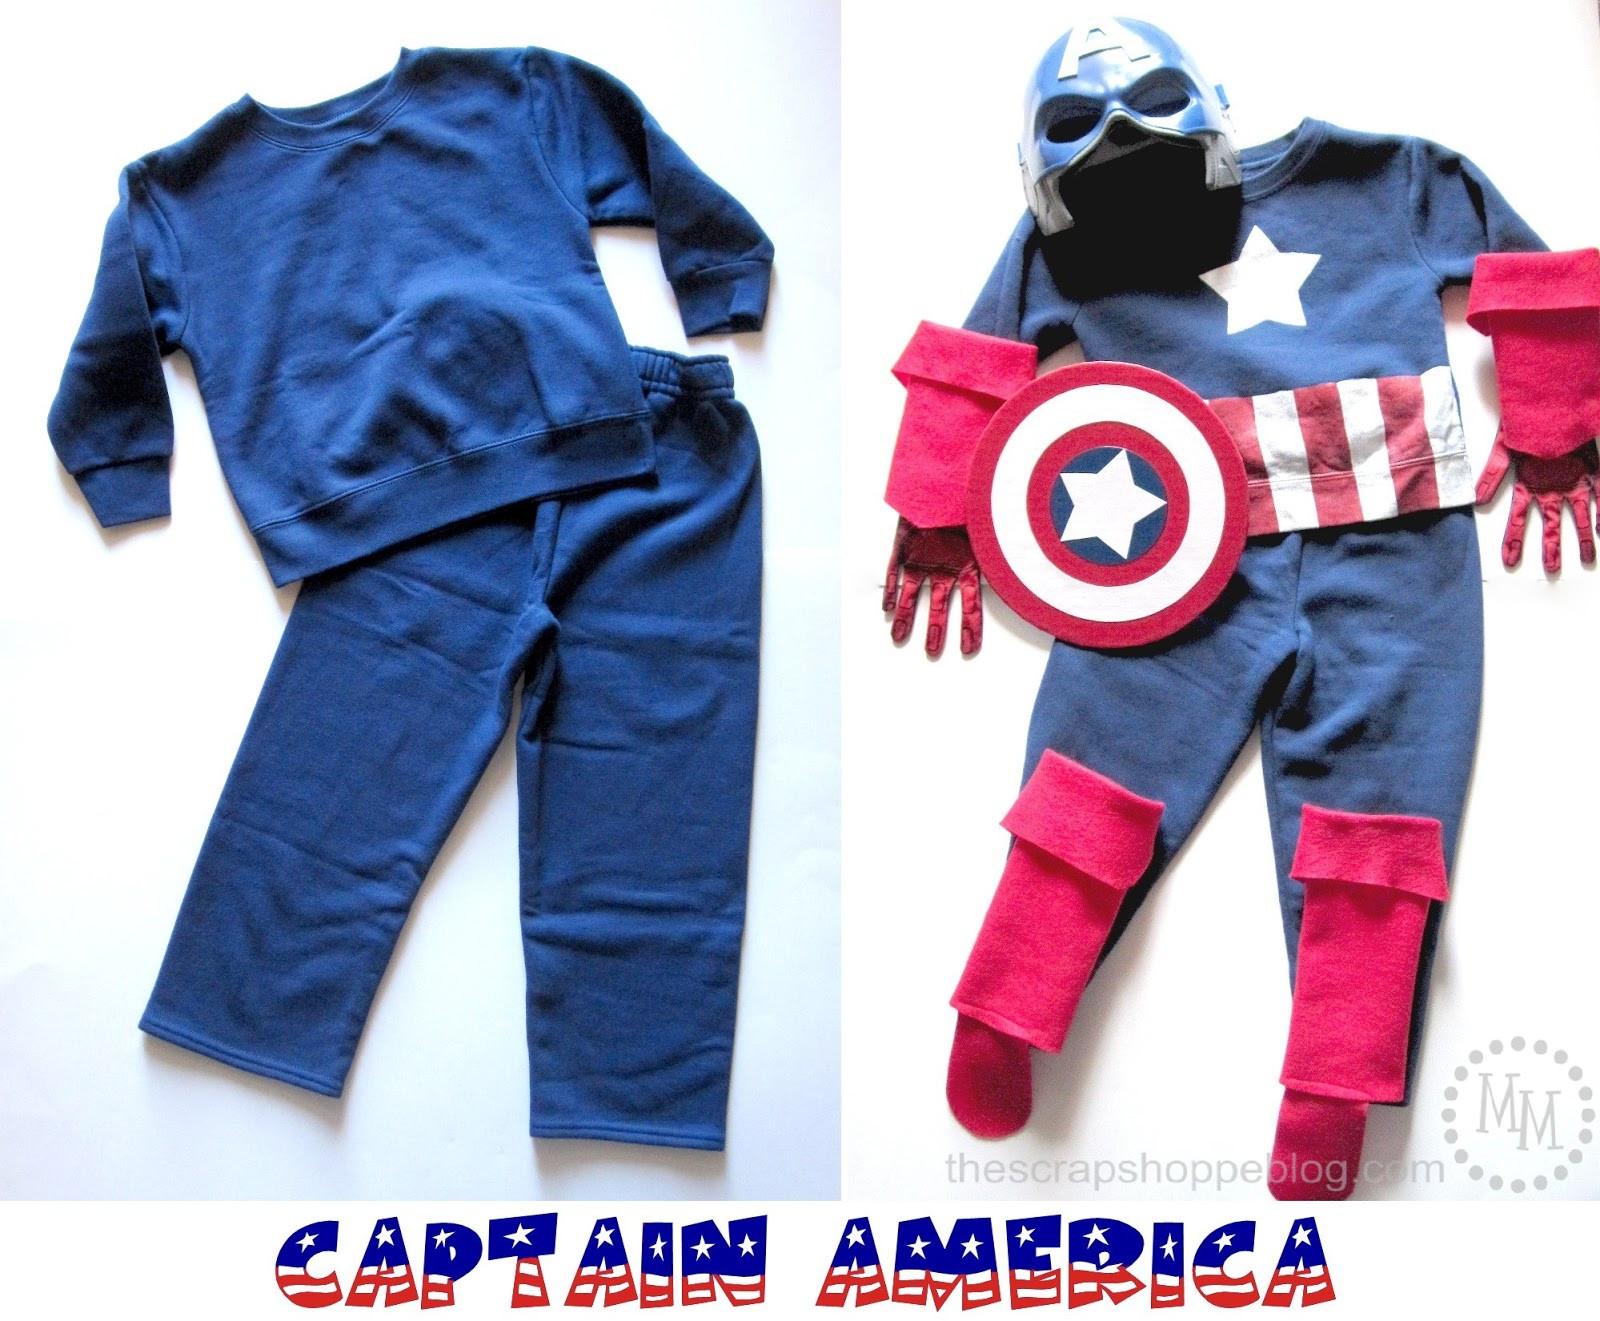 Best ideas about Captain America DIY Costume . Save or Pin DIY Captain America & Thor Costumes The Scrap Shoppe Now.